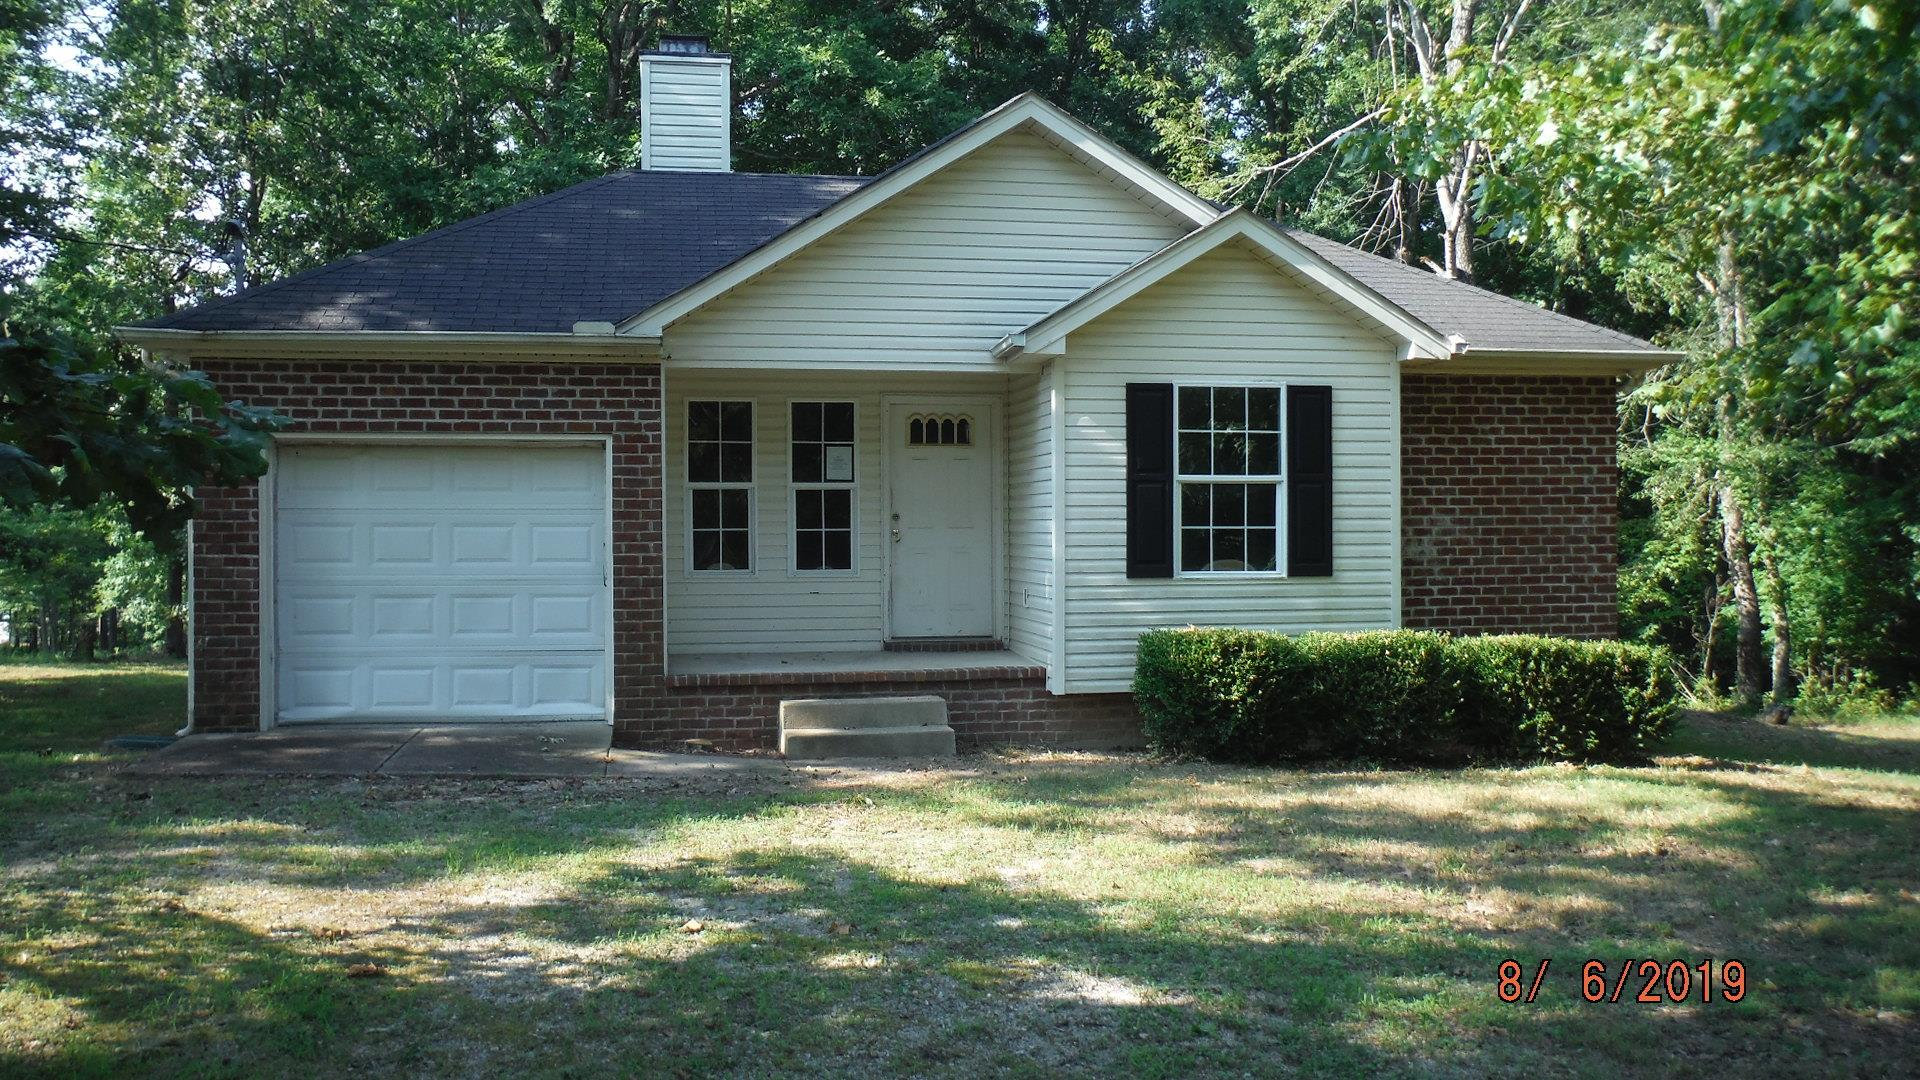 7768 Pinewood Rd, Nunnelly, TN 37137 - Nunnelly, TN real estate listing